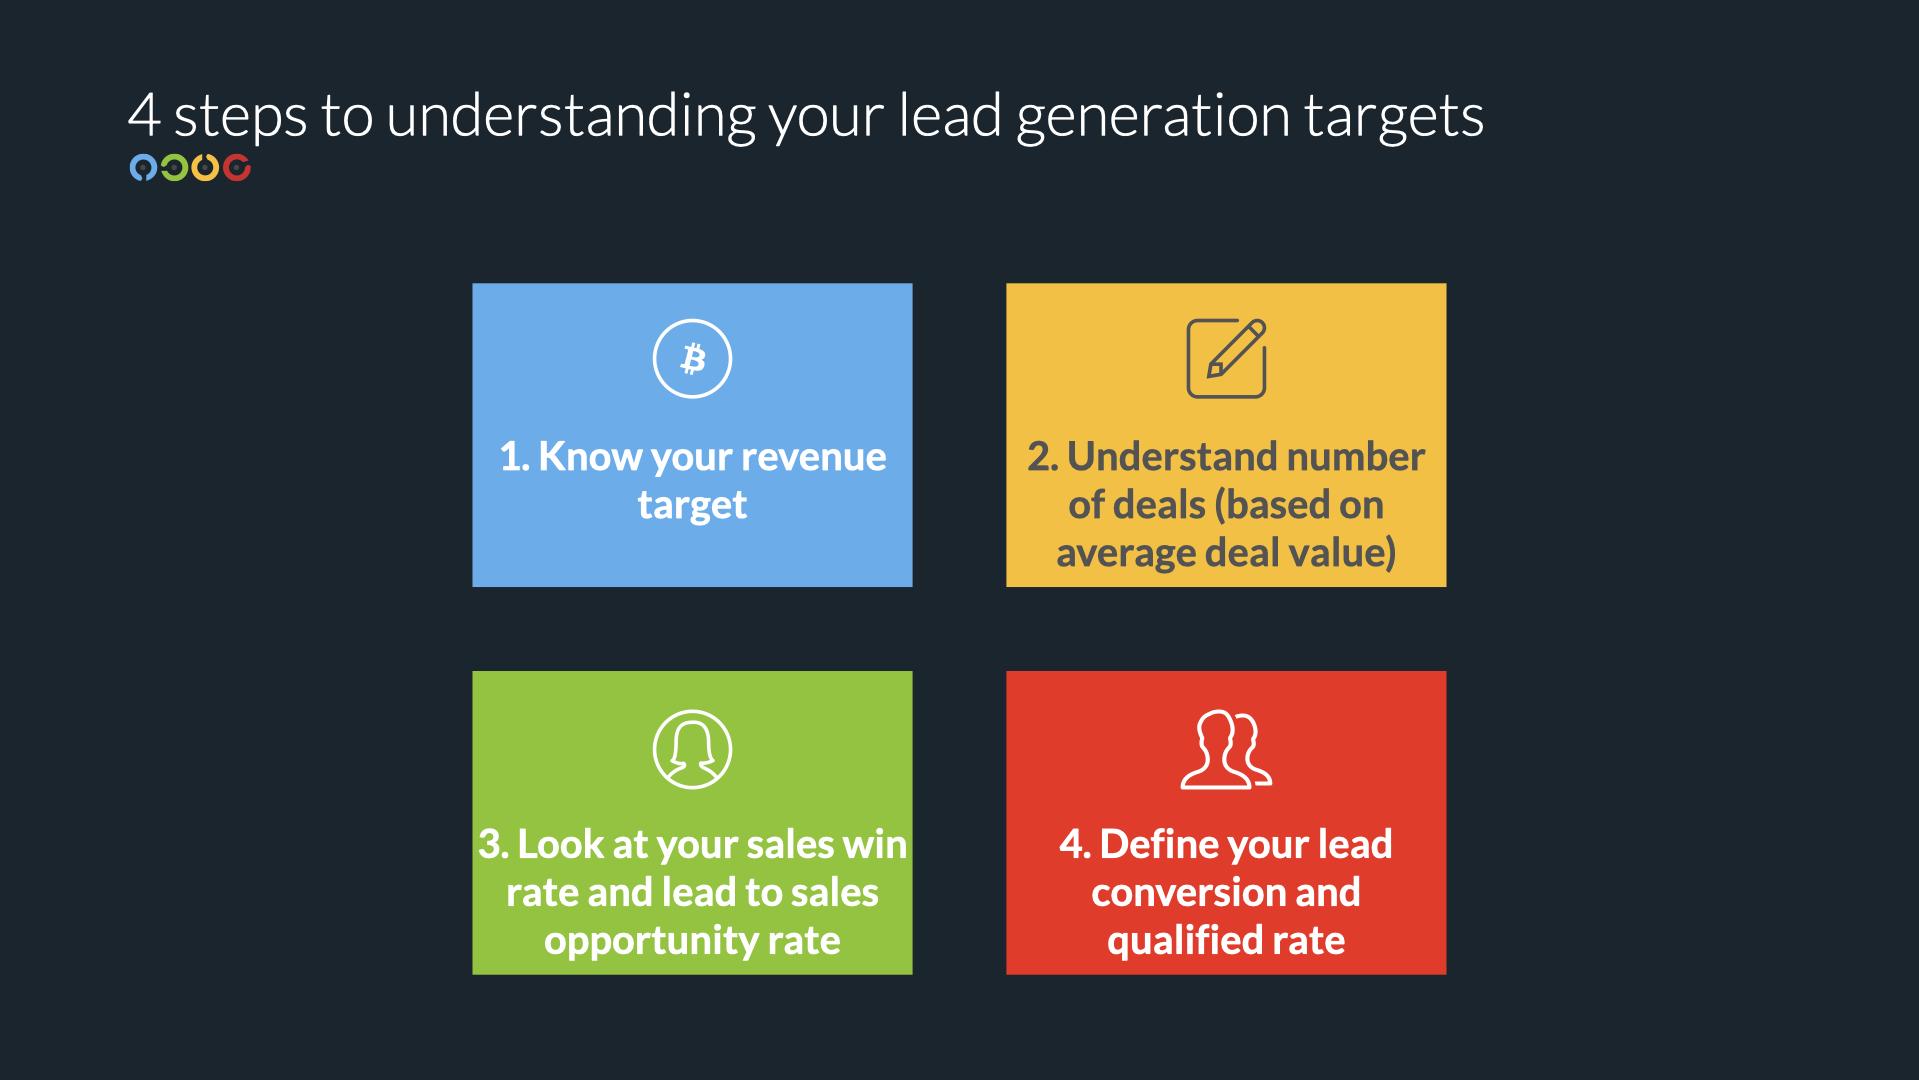 lead generation targets